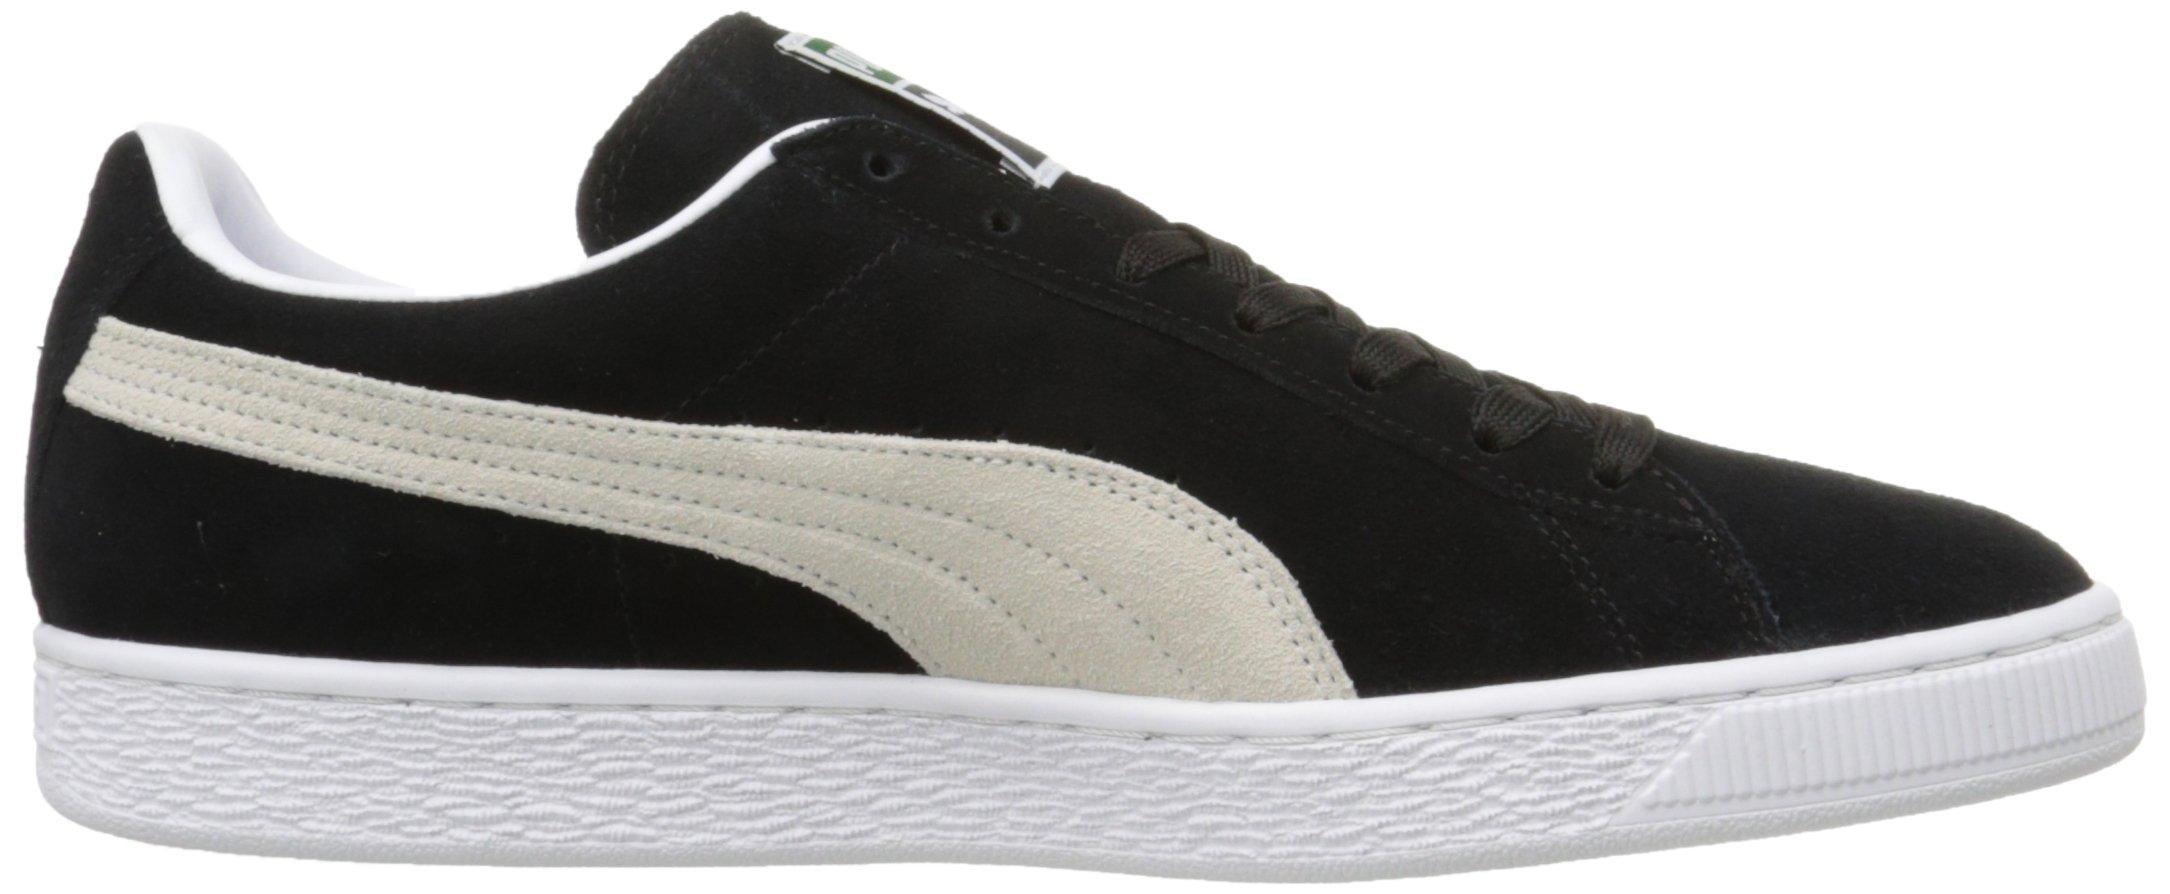 PUMA Suede Classic Sneaker,Black/White,9.5 M US Men's by PUMA (Image #15)